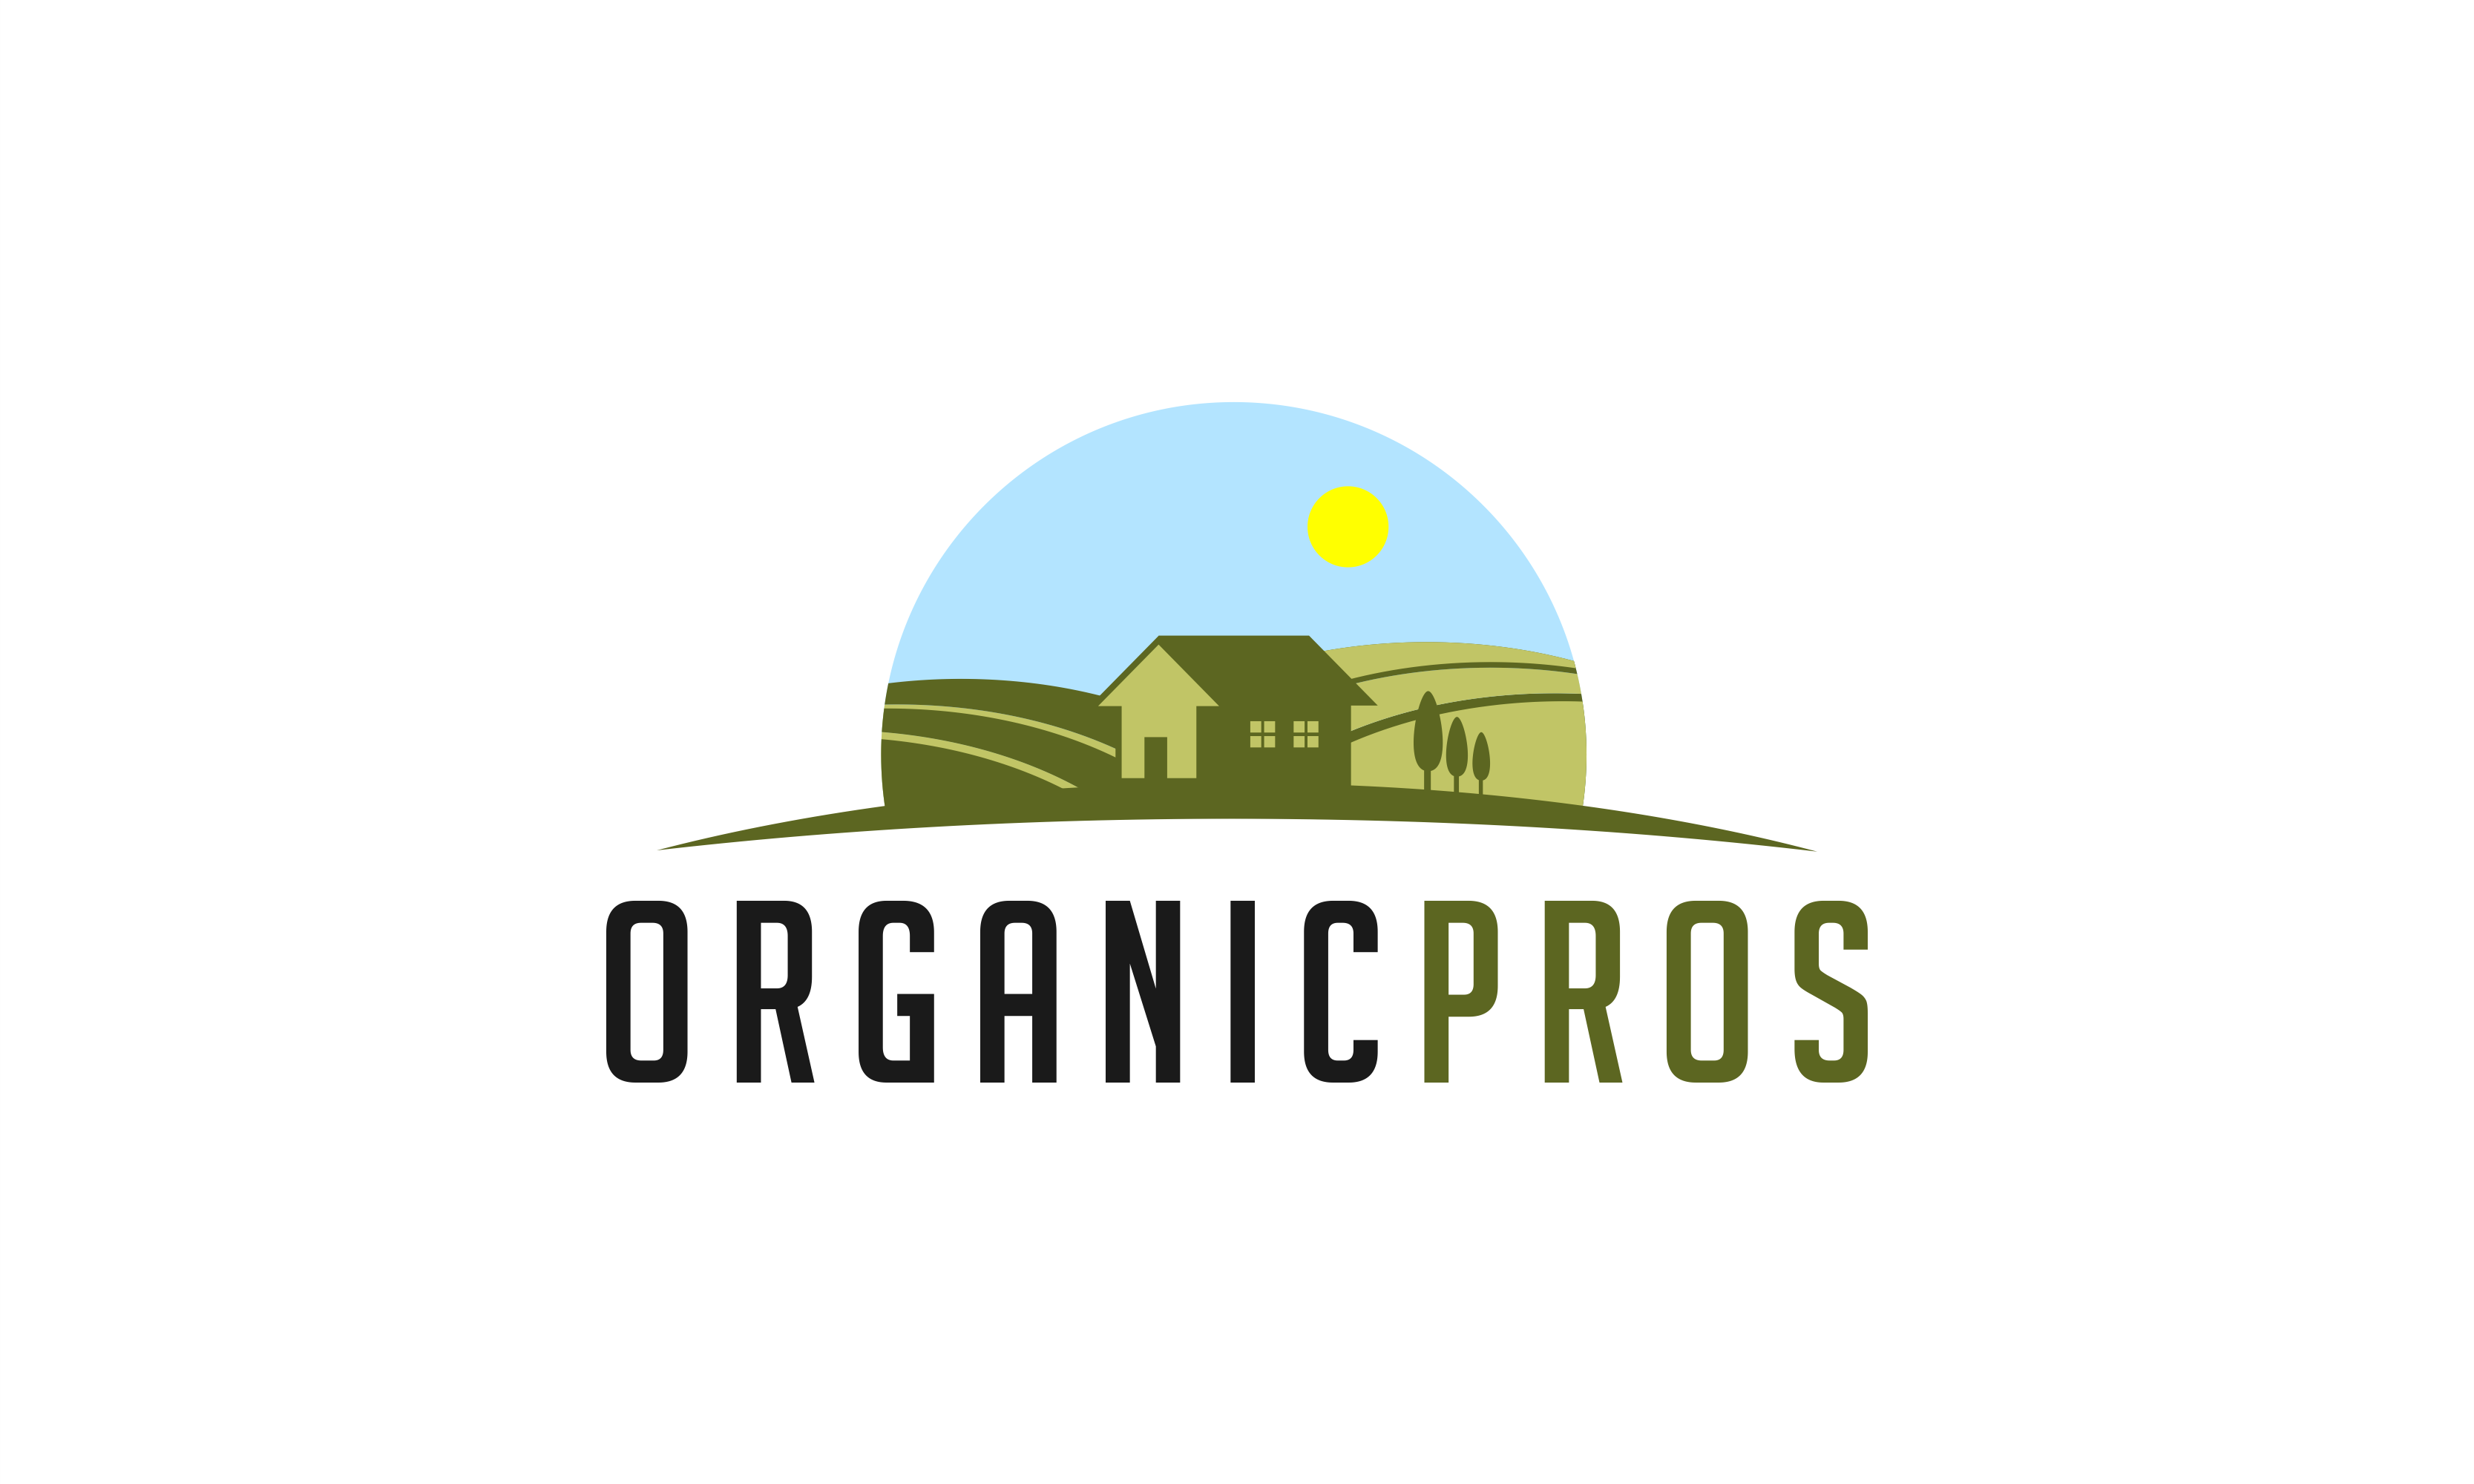 Organicpros